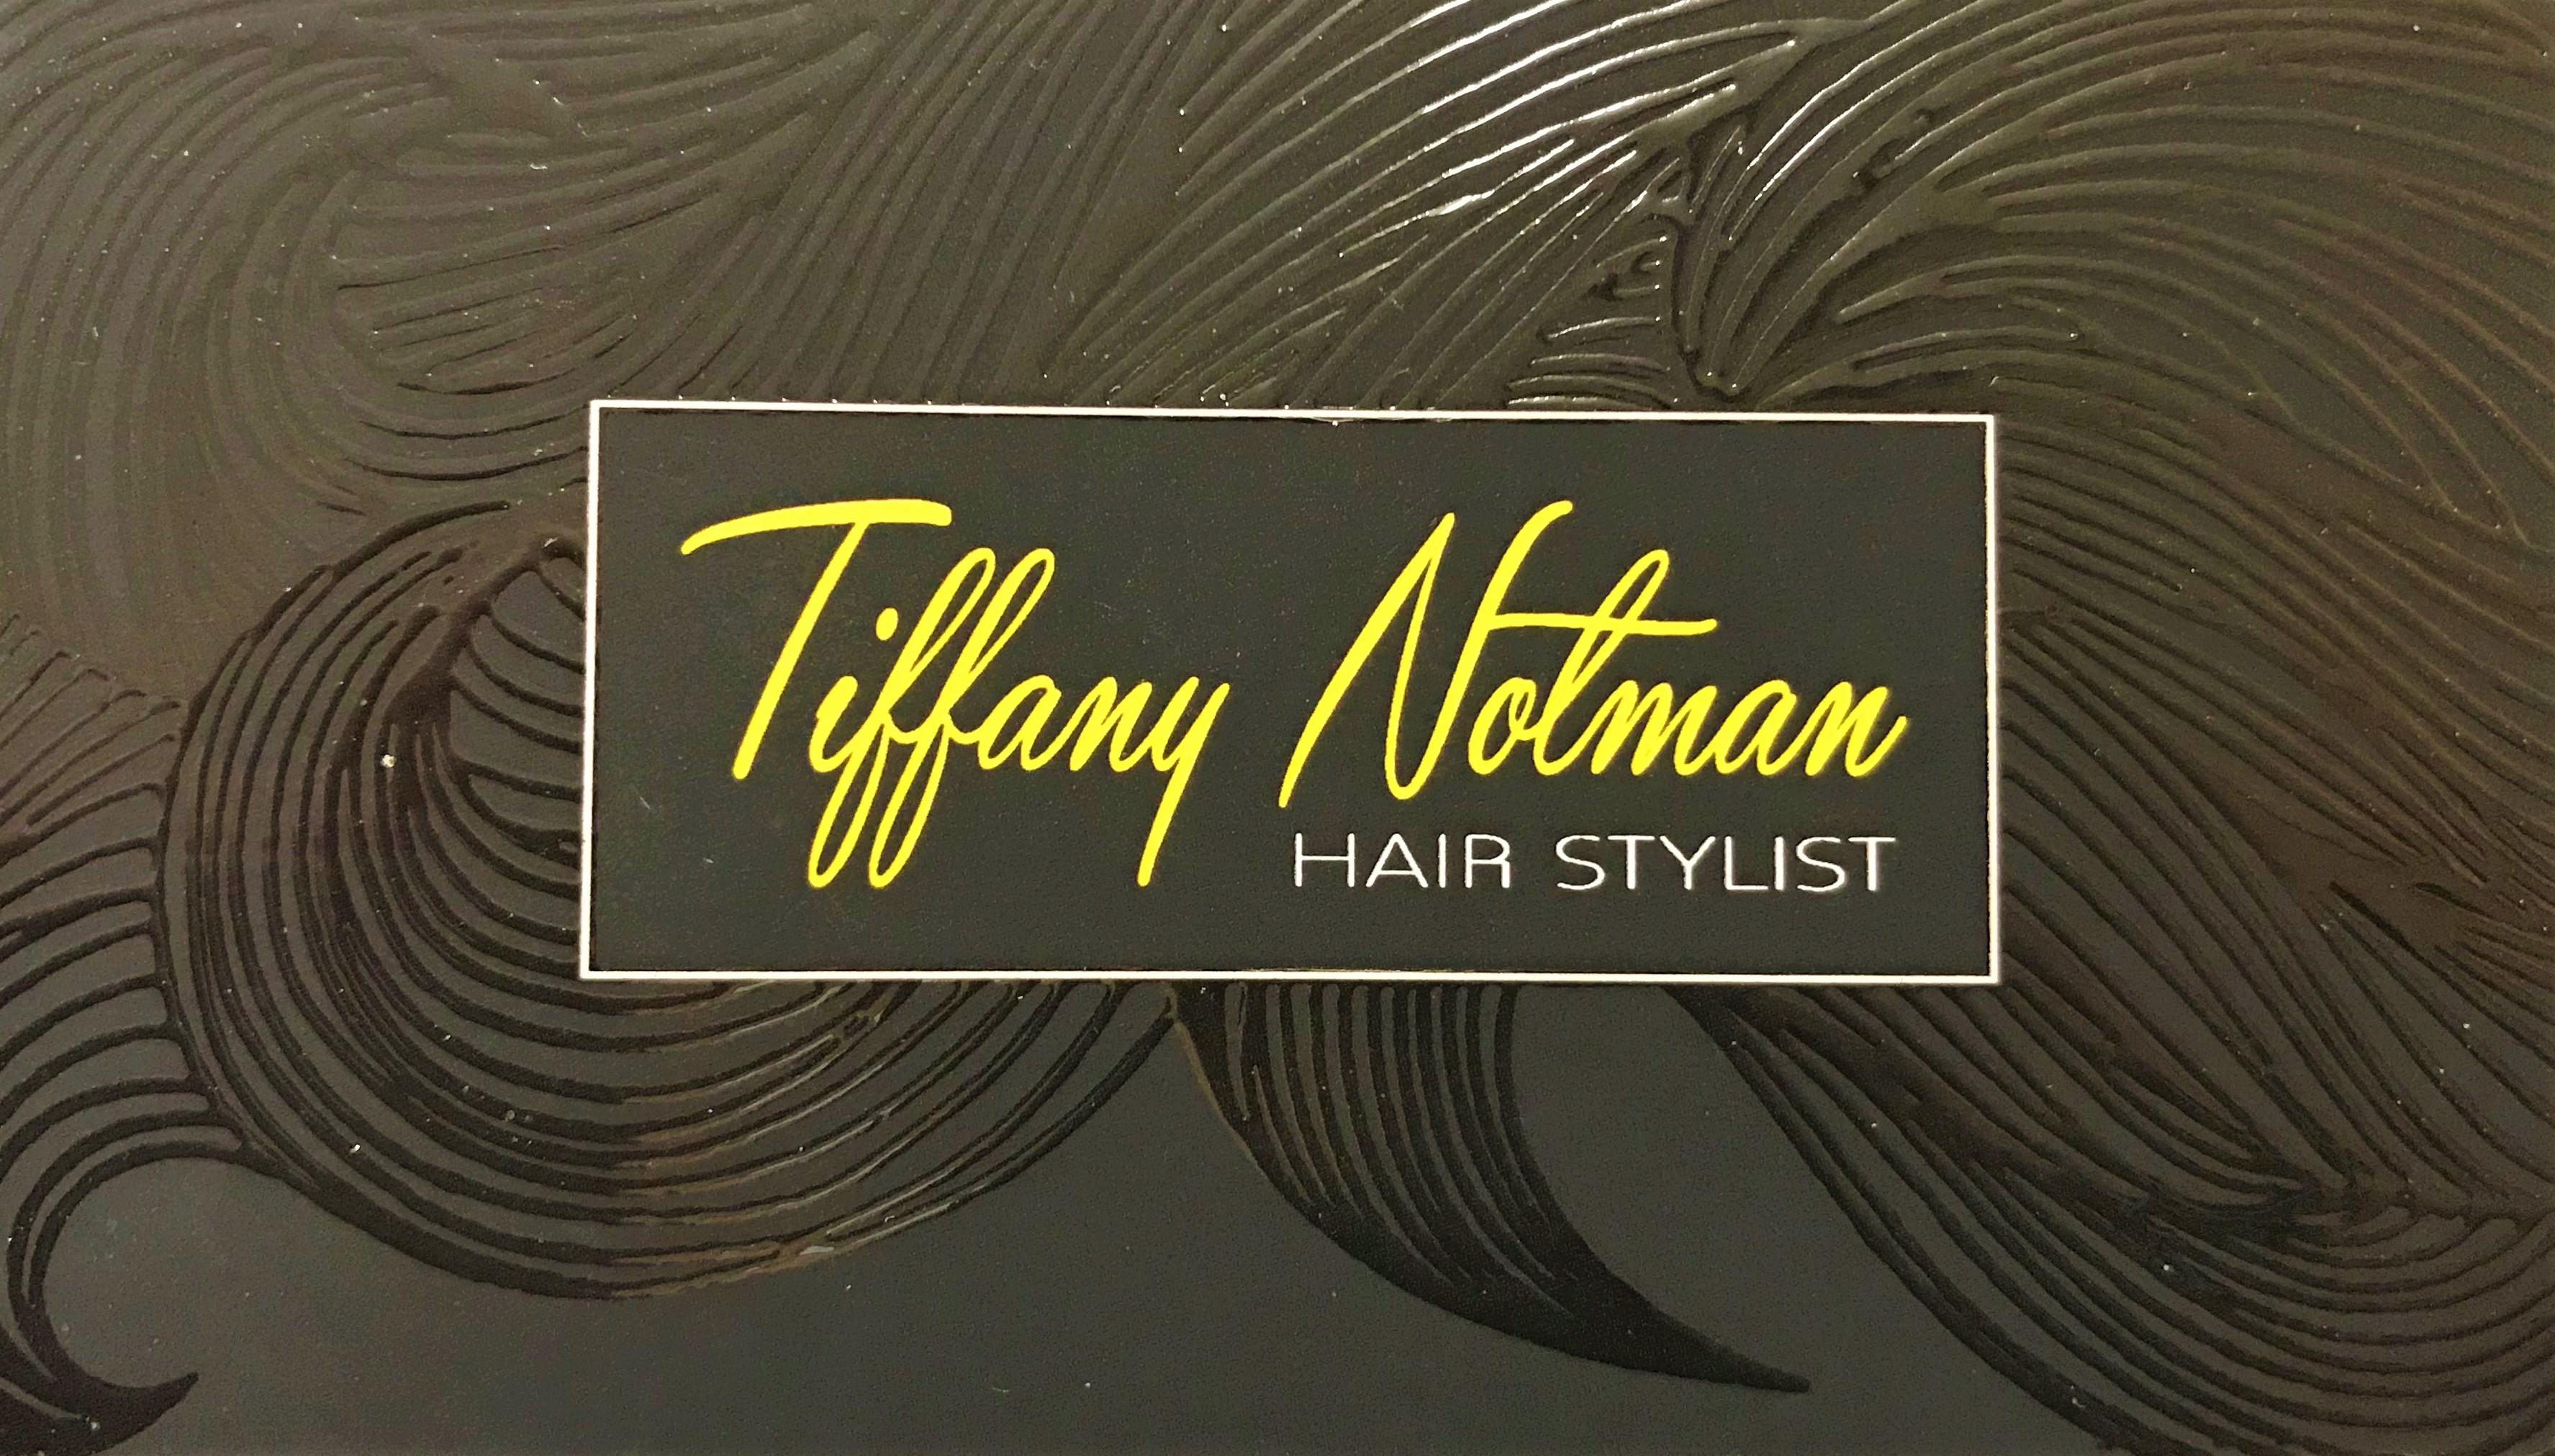 raised spot uv business card tiffany notman